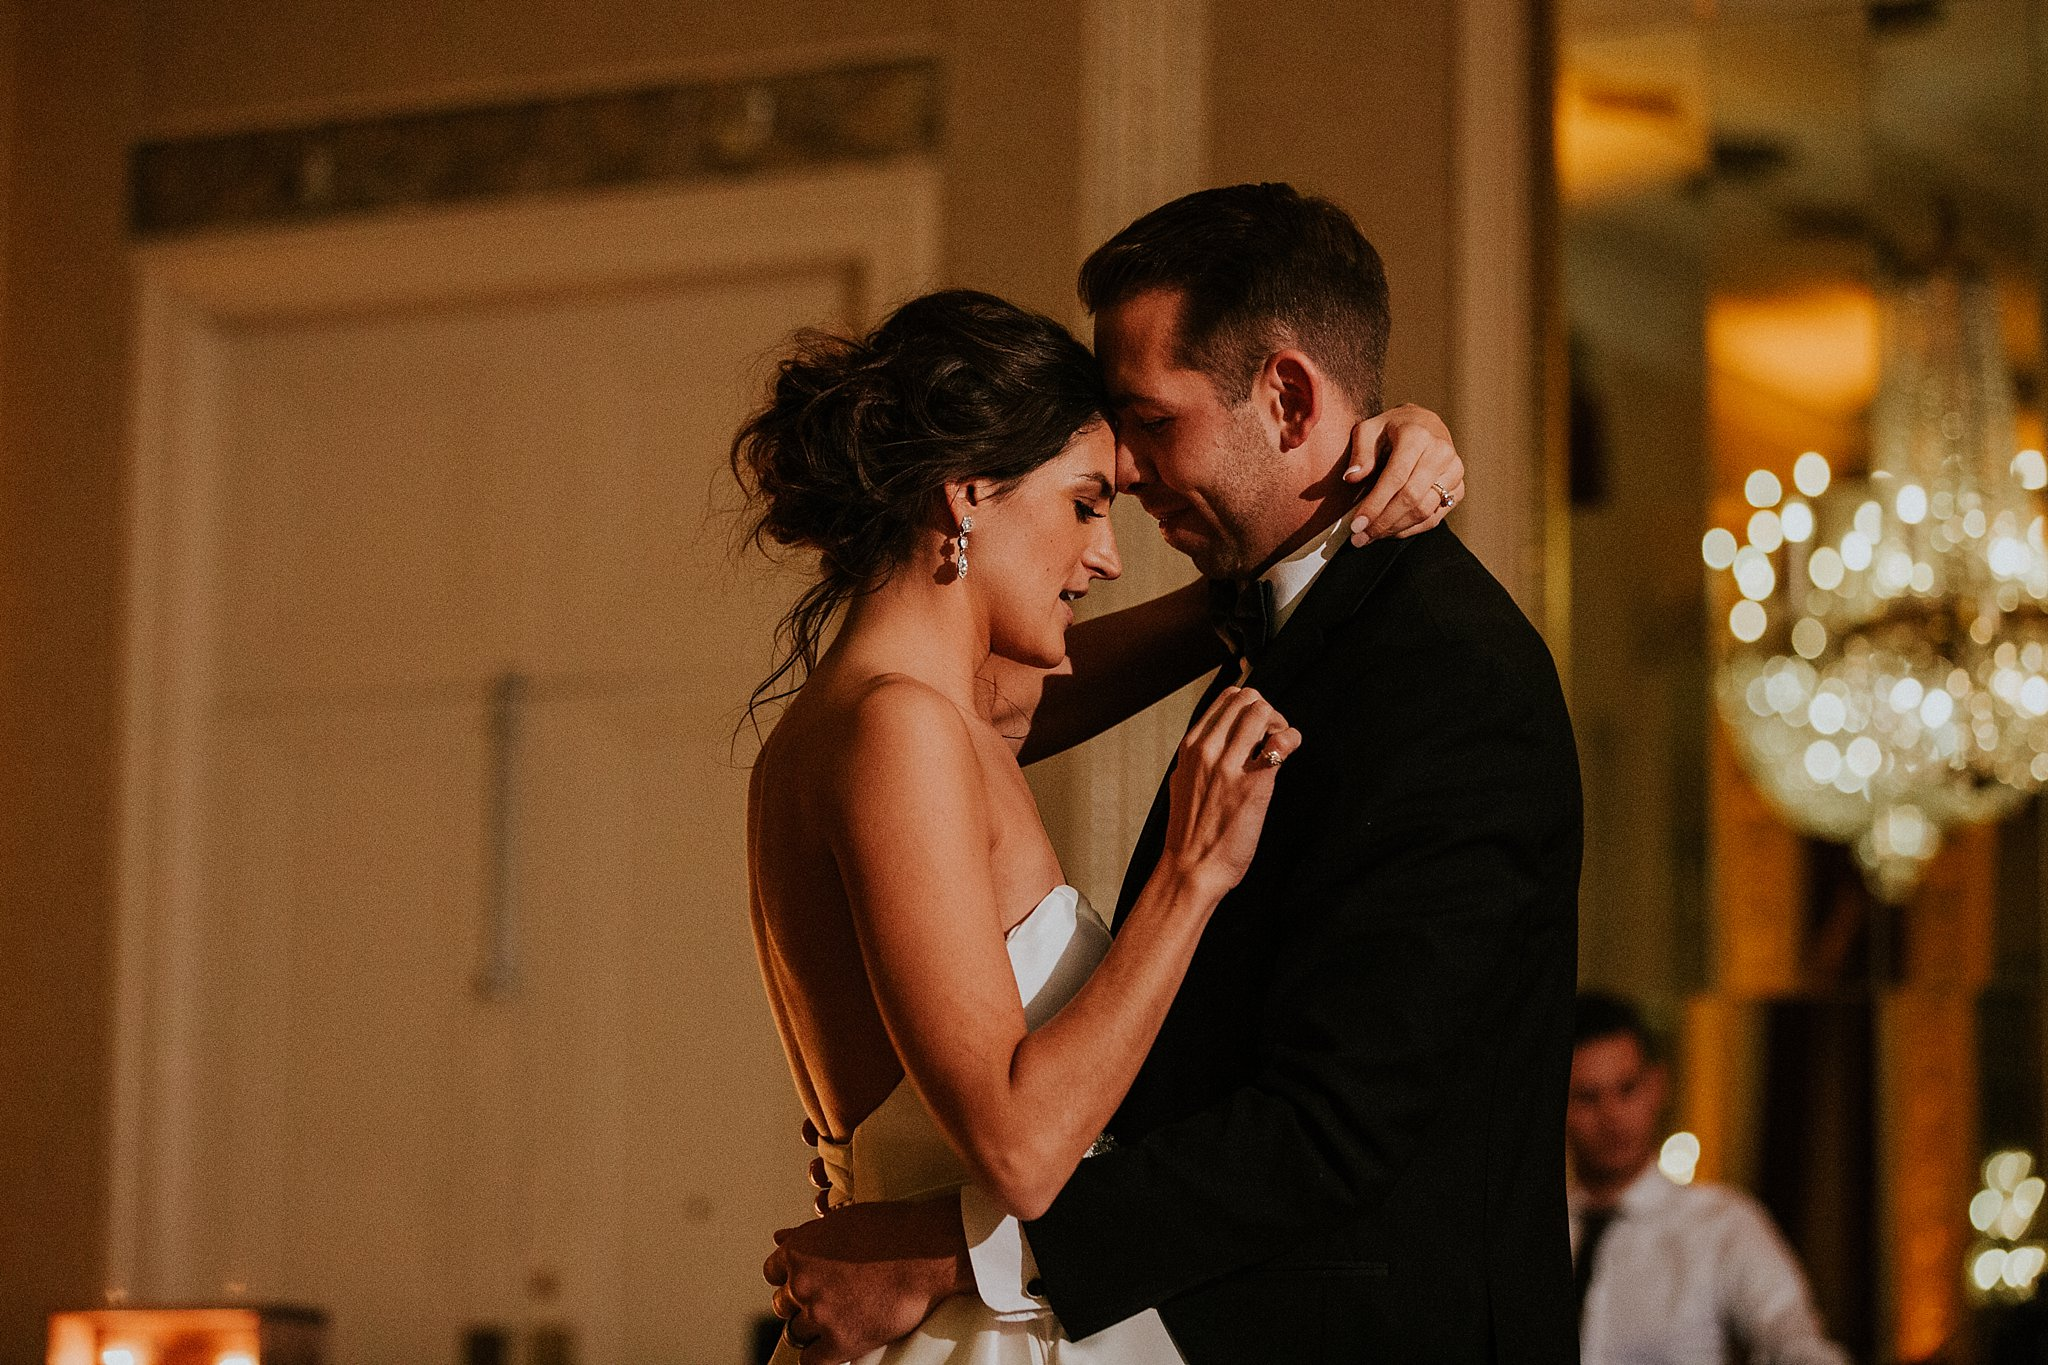 Matt-Lauren_St-Marys_Hilton-City-Center-Milwaukee-Wedding_liller-photo_0090.jpg